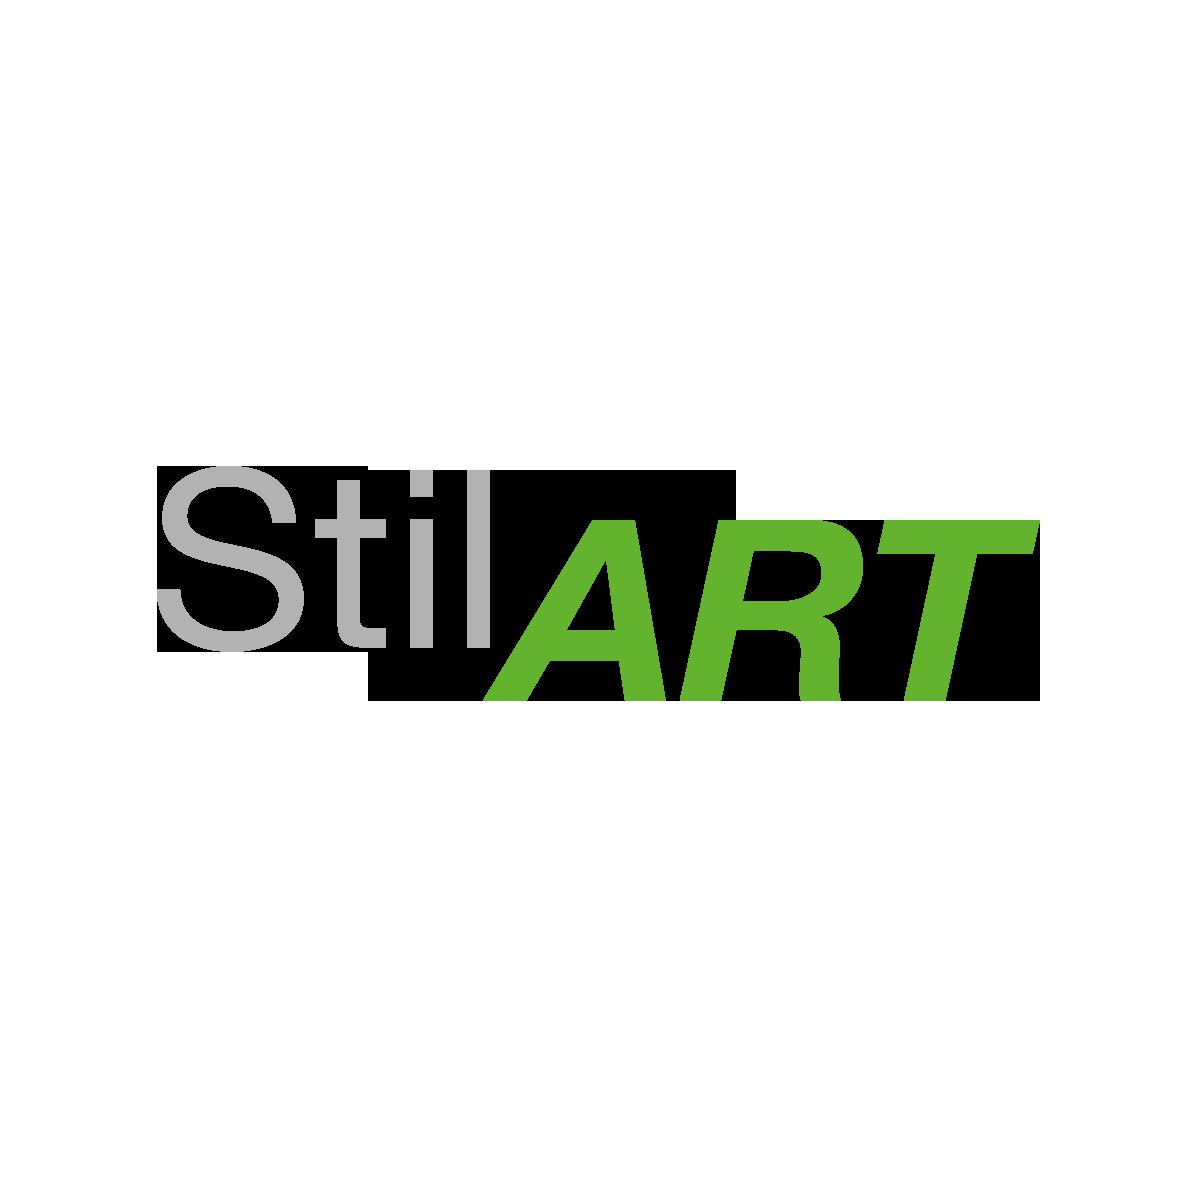 StilART Möbelwerkstätten GmbH